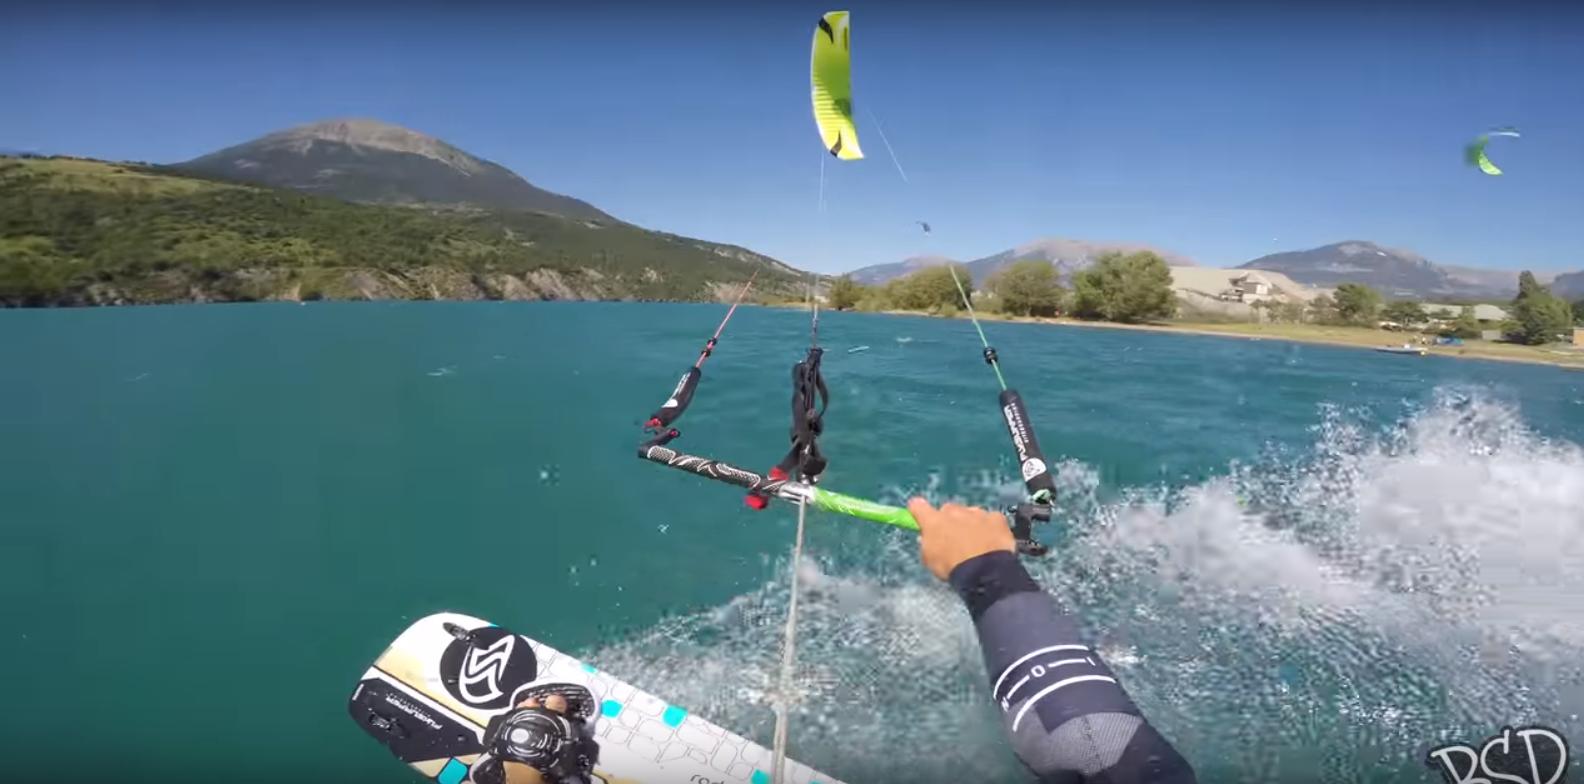 Airstyle at the lake ! Part #1